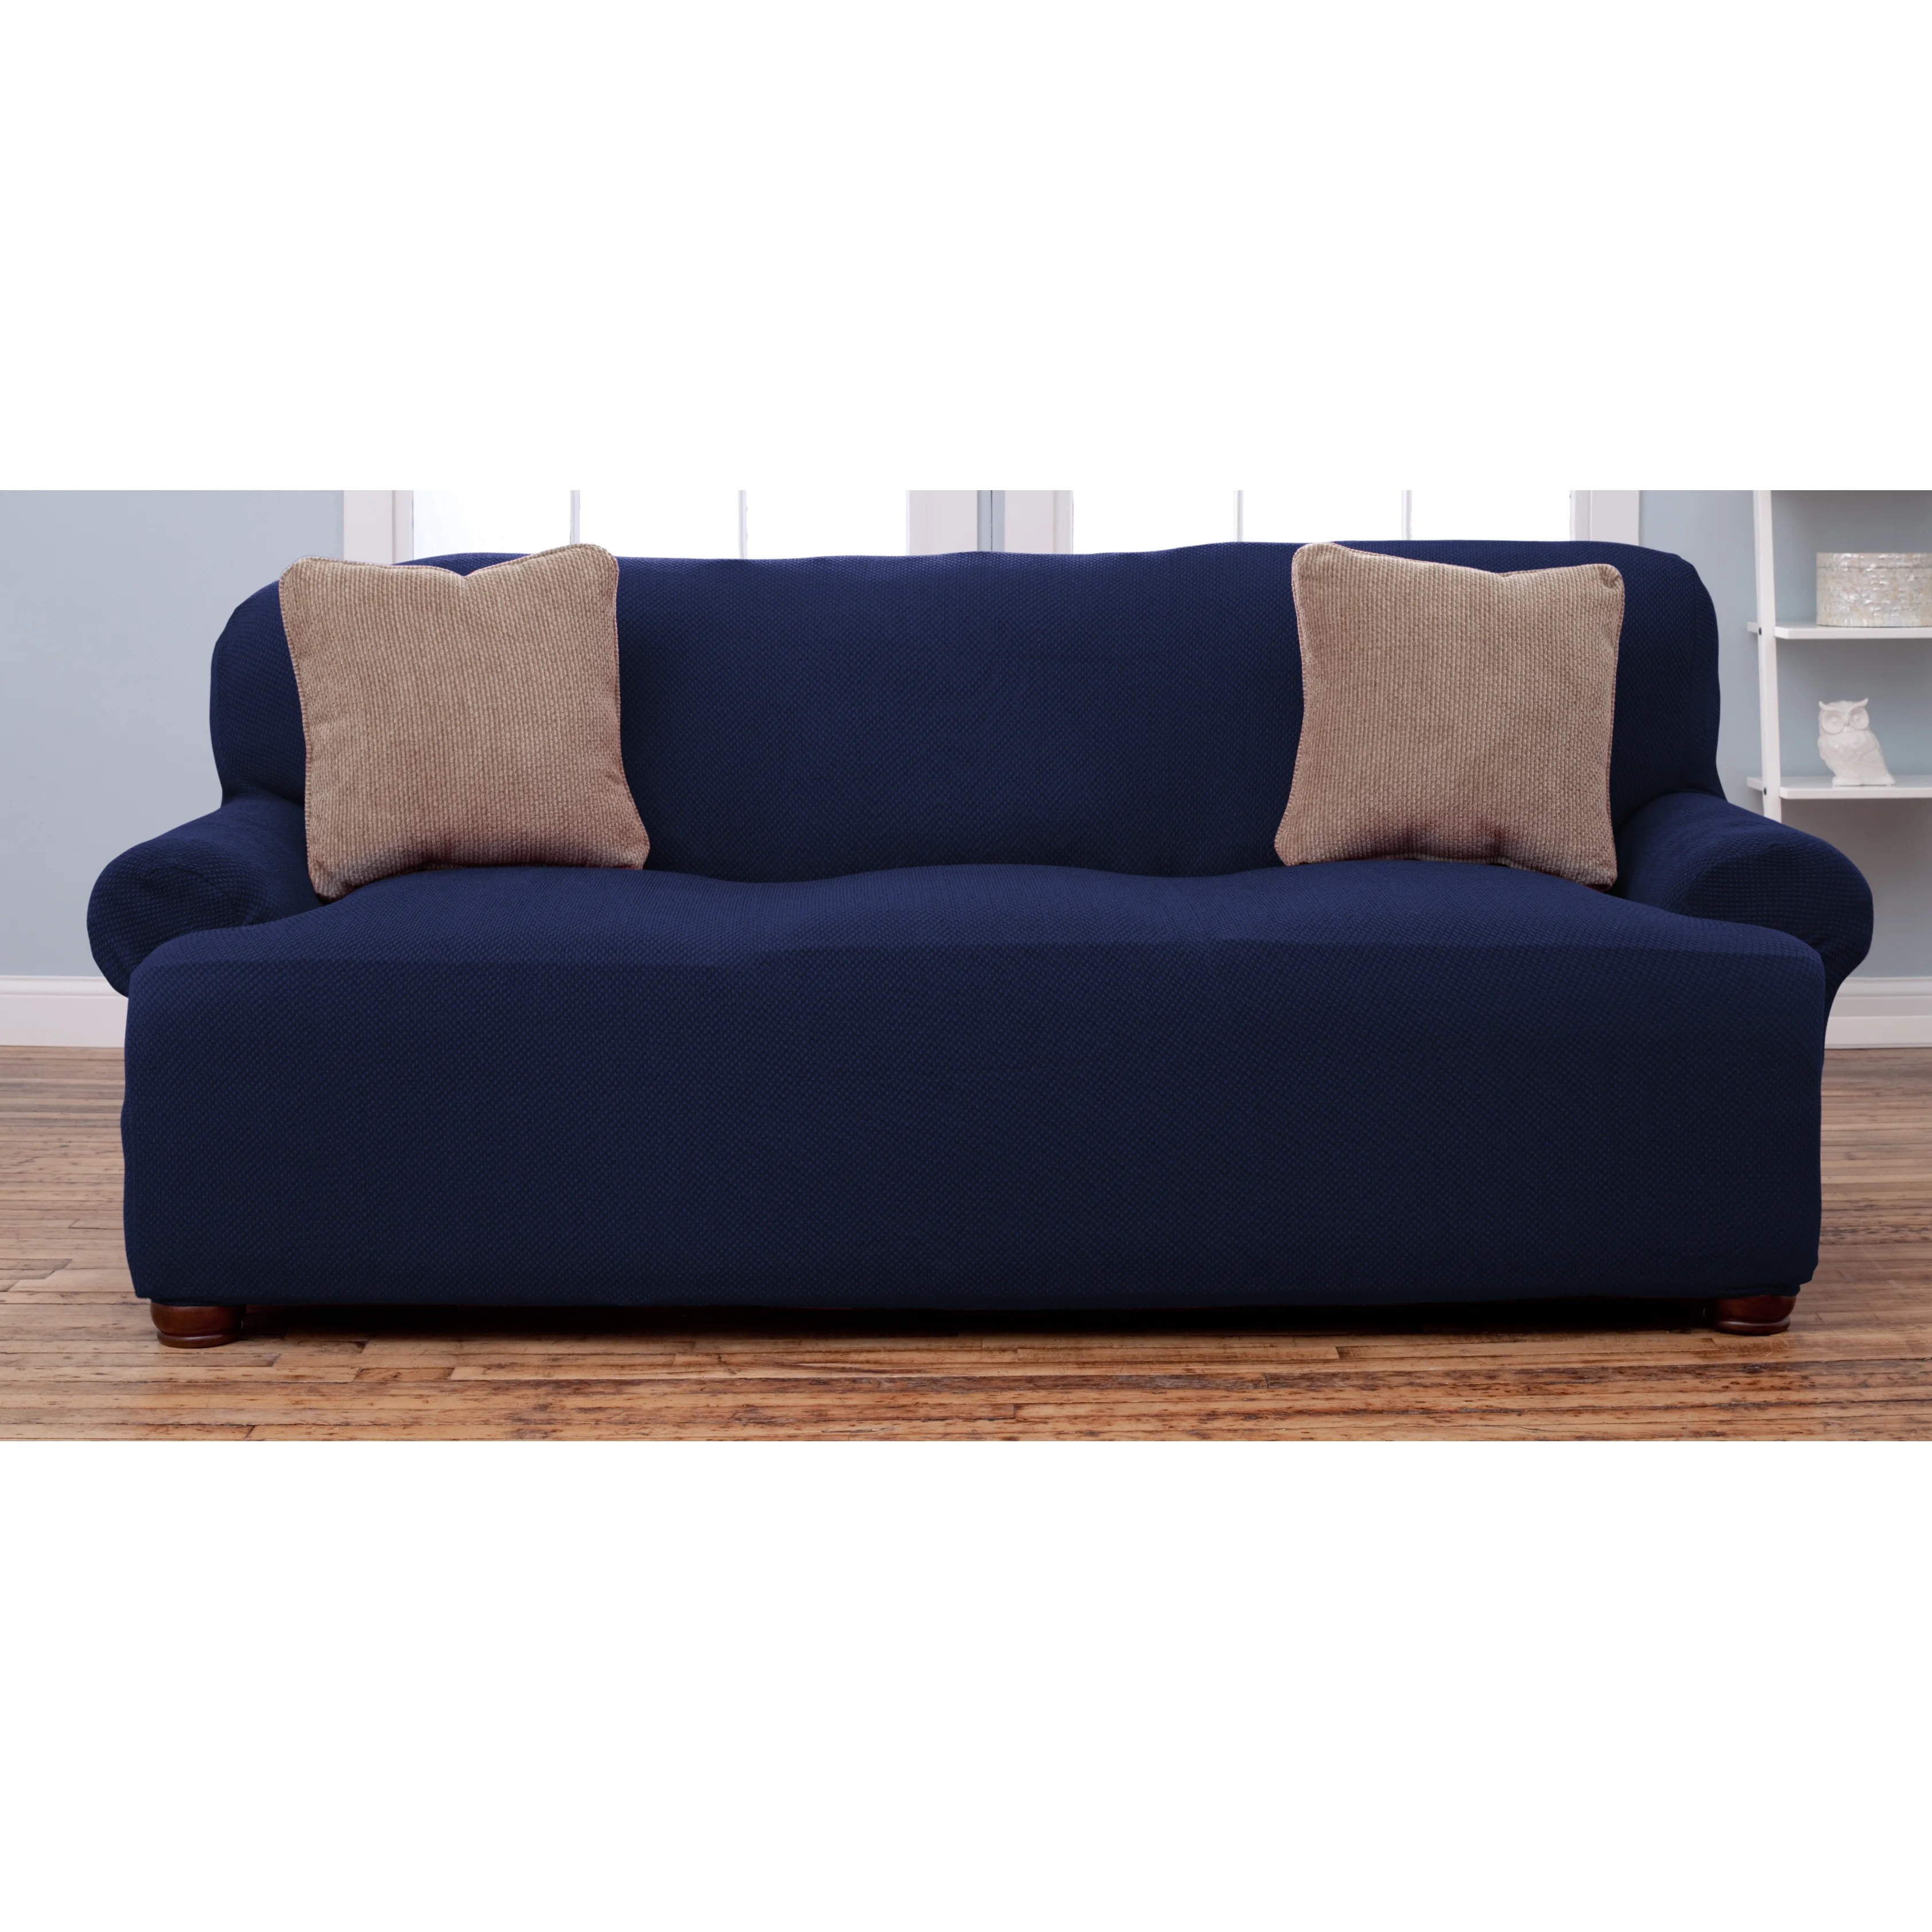 ekeskog sofa slipcover manwah futon covers roselawnlutheran